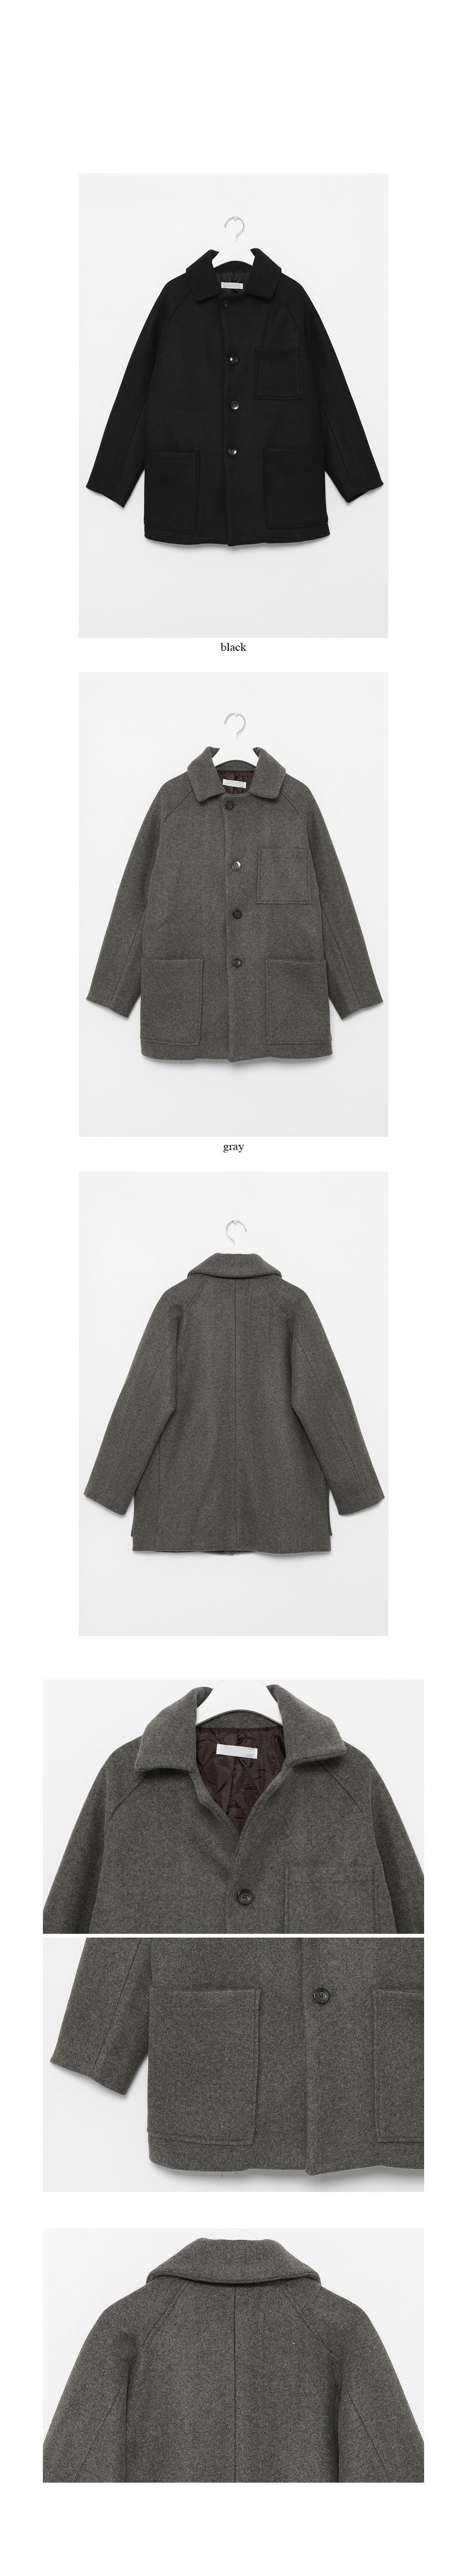 3 pocket midi jacket